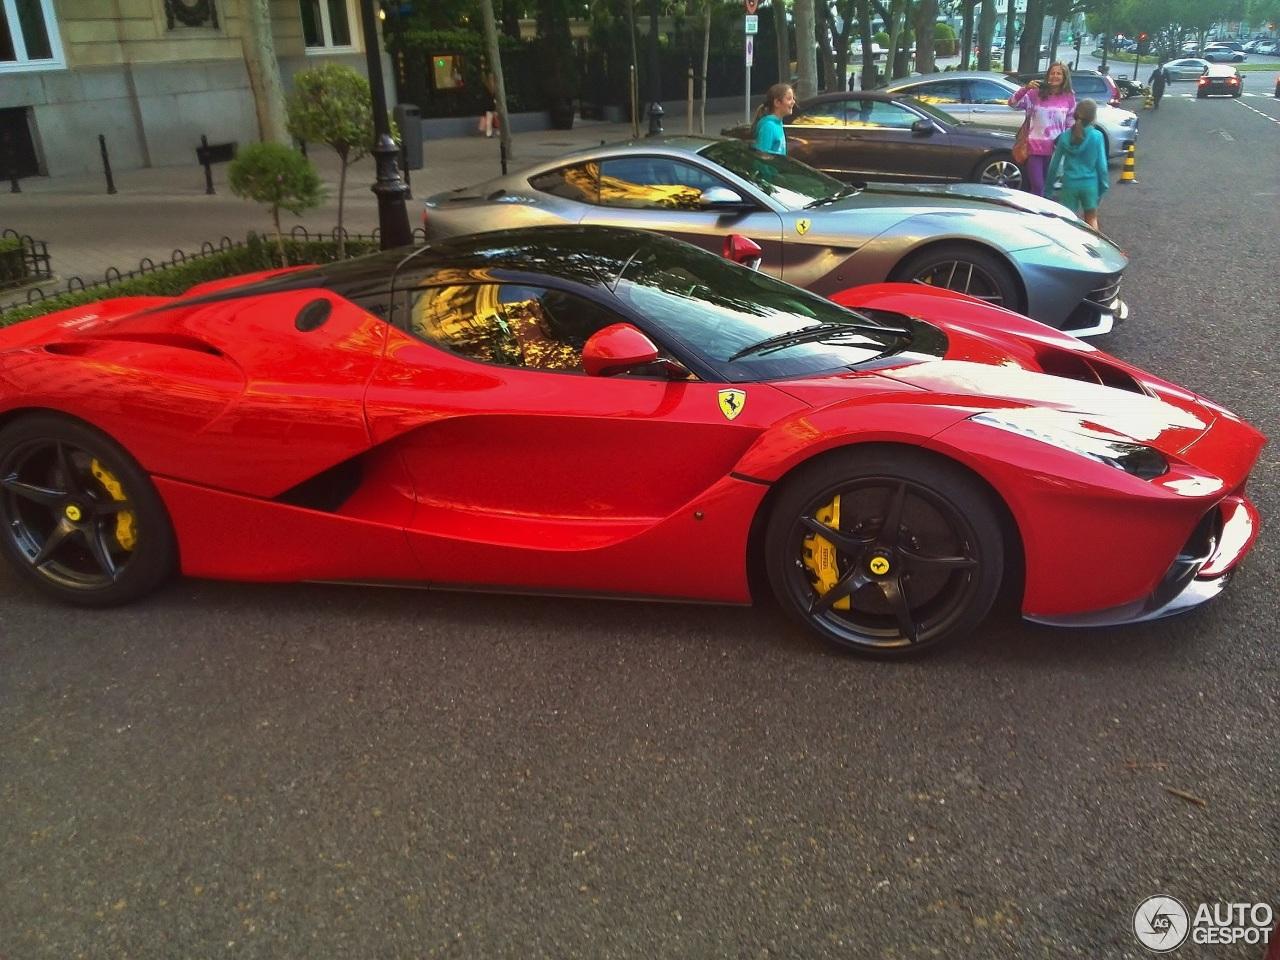 Ferrari Laferrari 6 July 2014 Autogespot